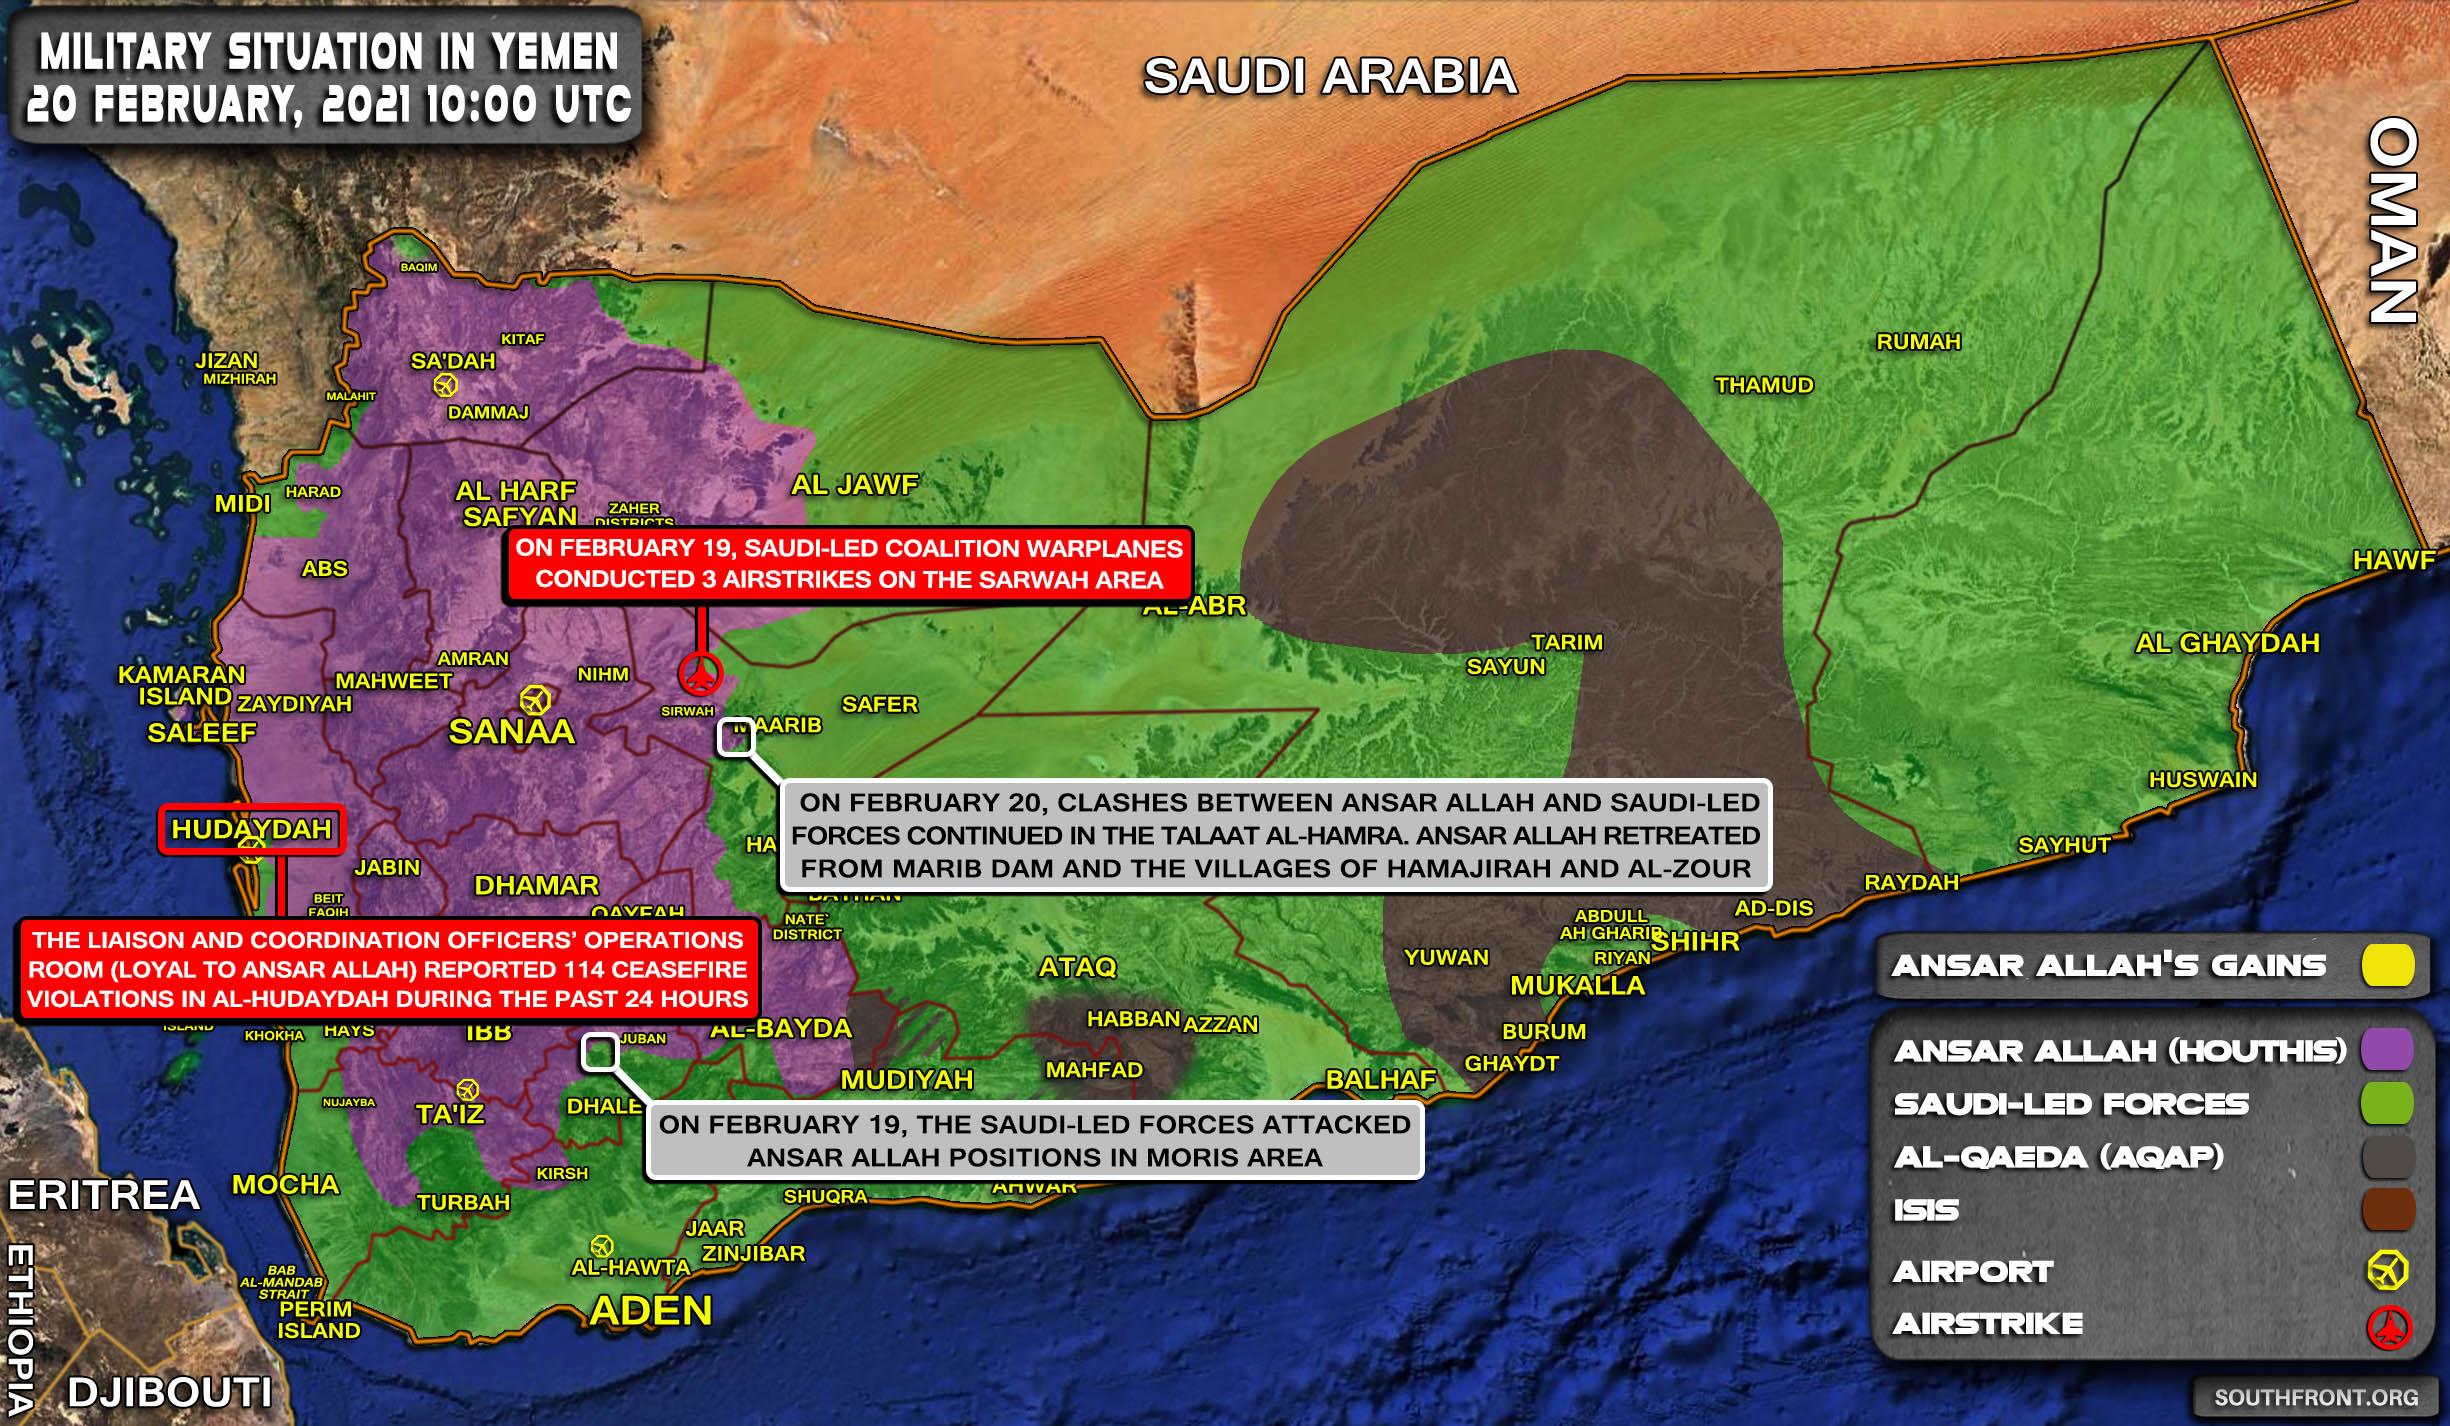 Houthis Withdraw From Marib Dam (Map Update)